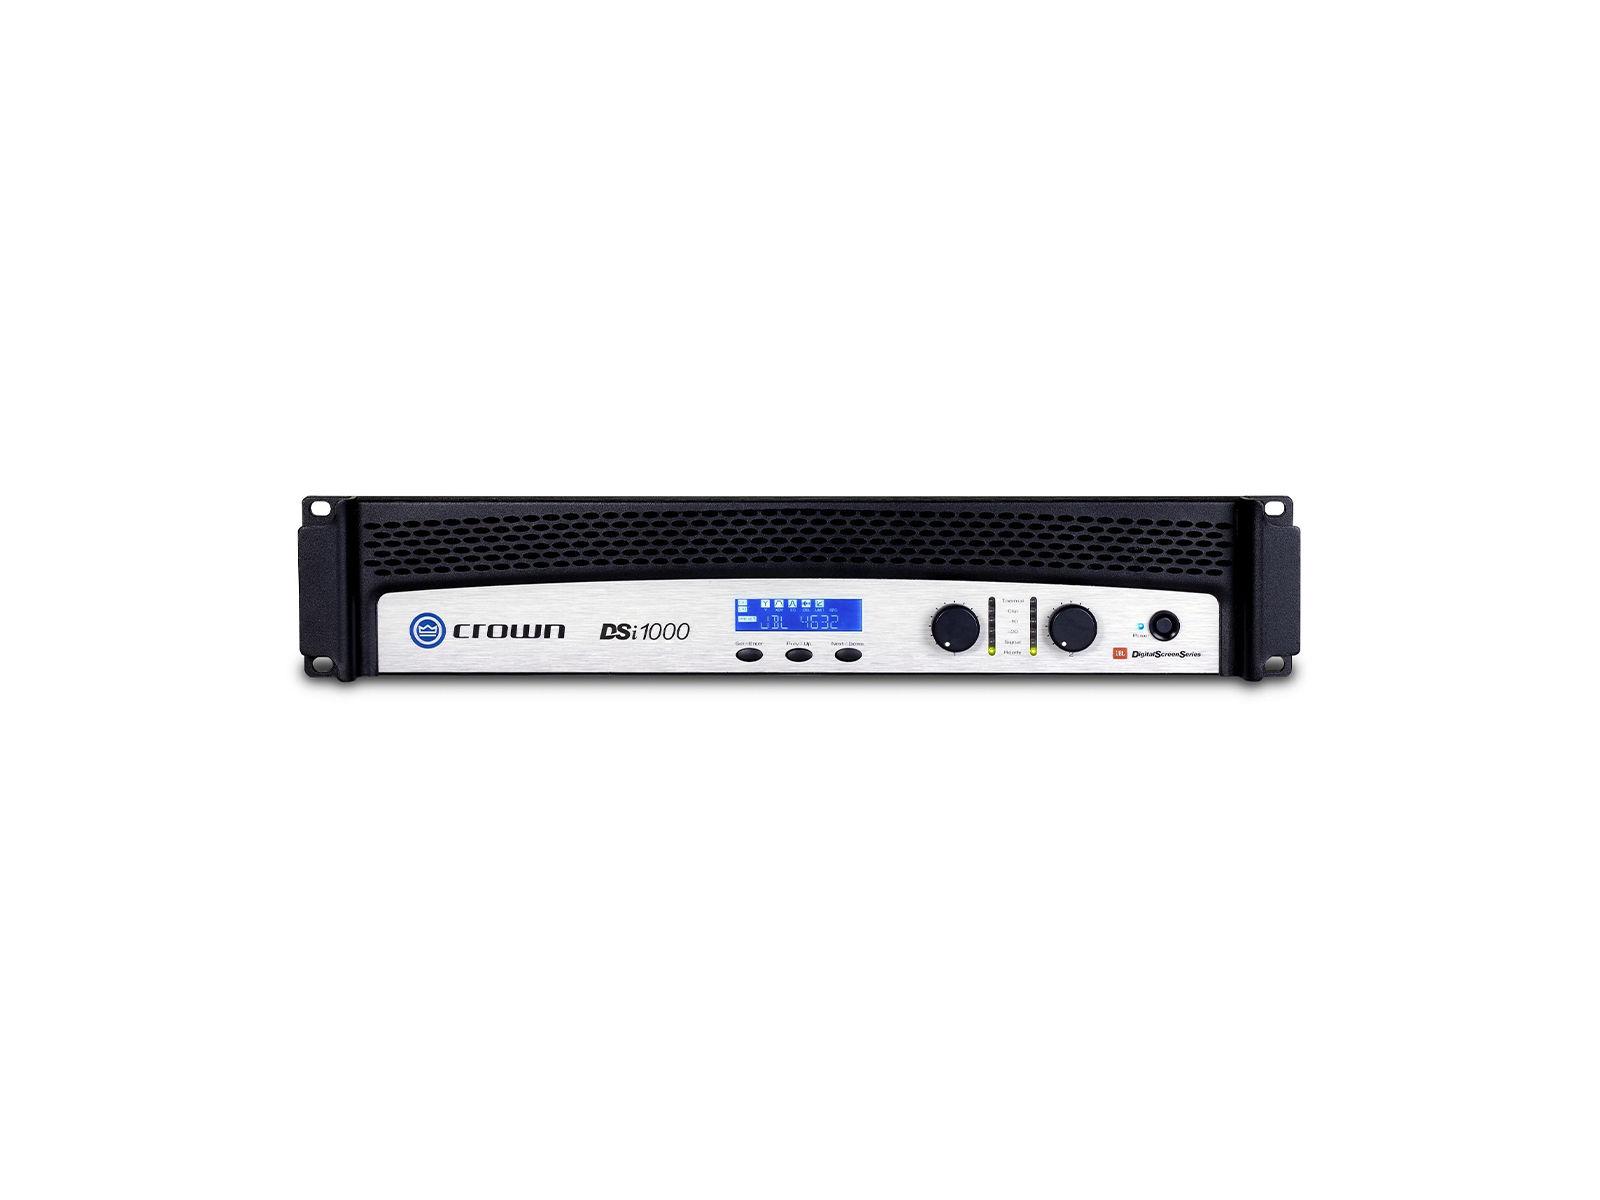 Crown DSi 1000 | Endstufe, 2x 475W/4Ω, DSP, LCD, HiQnet, Phoenix, D-Sub, Cinema (THX approved)